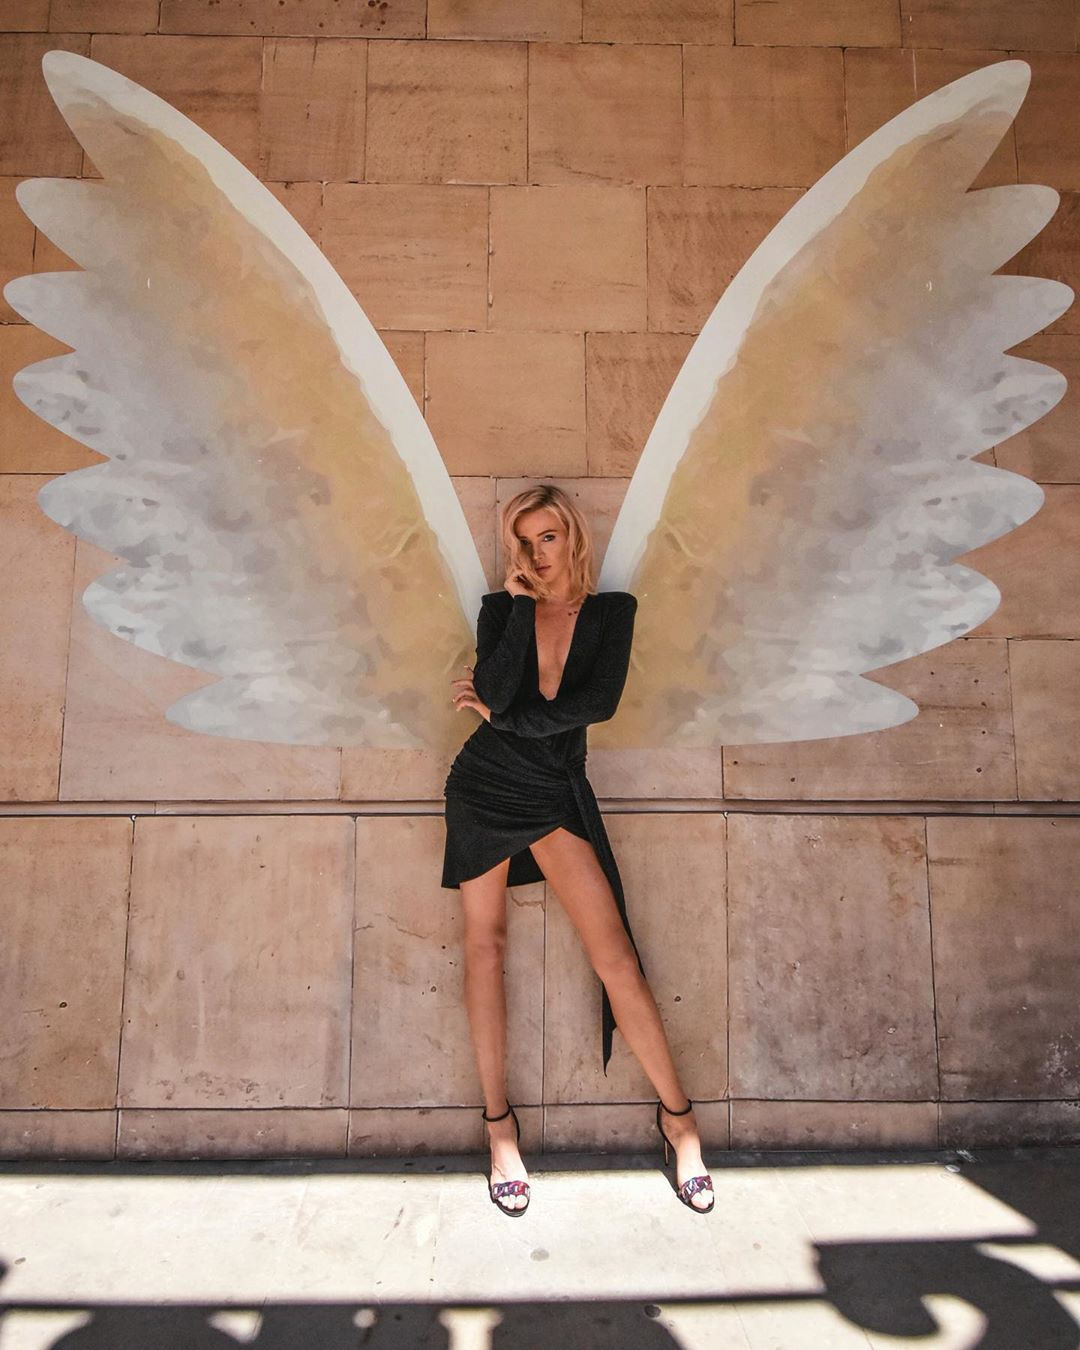 kobieta skrzydła mural maffashion blogerka